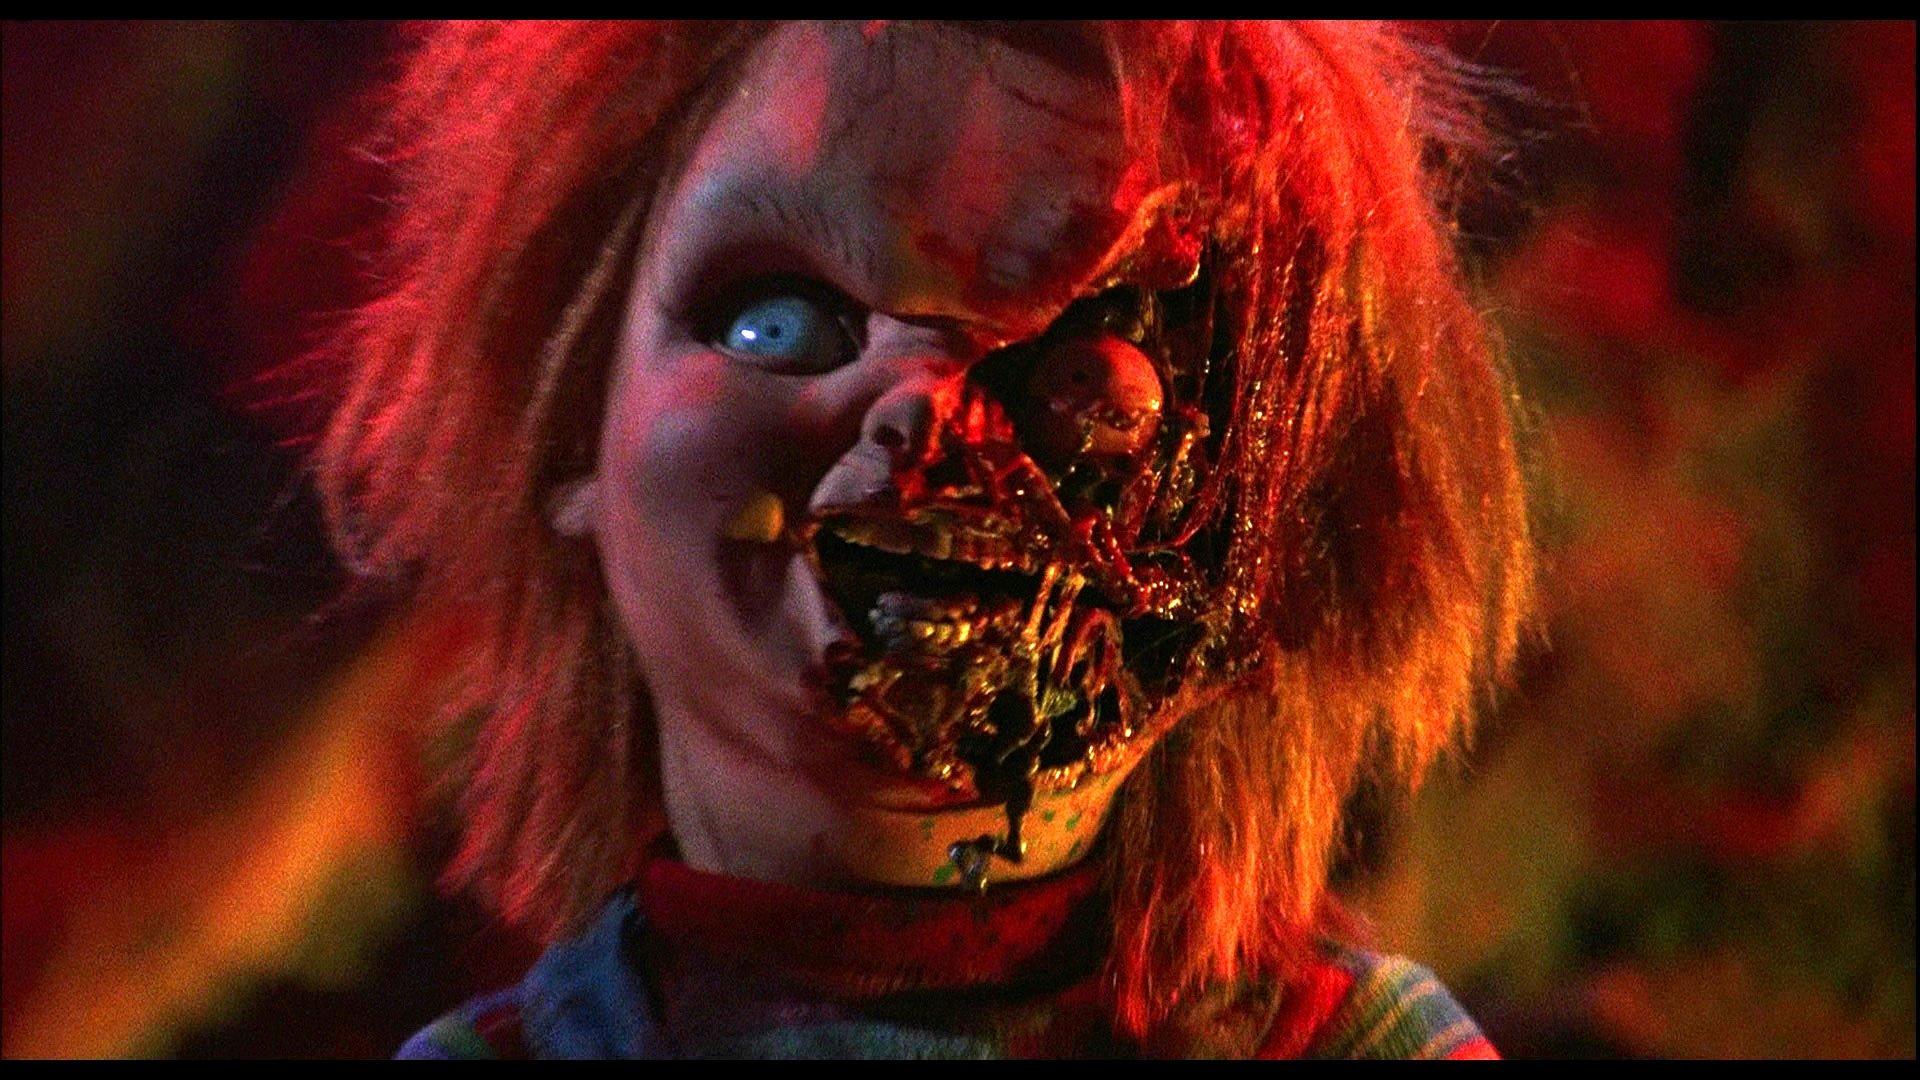 CHILDS PLAY chucky dark horror creepy scary 28 wallpaper 1920x1080 1920x1080